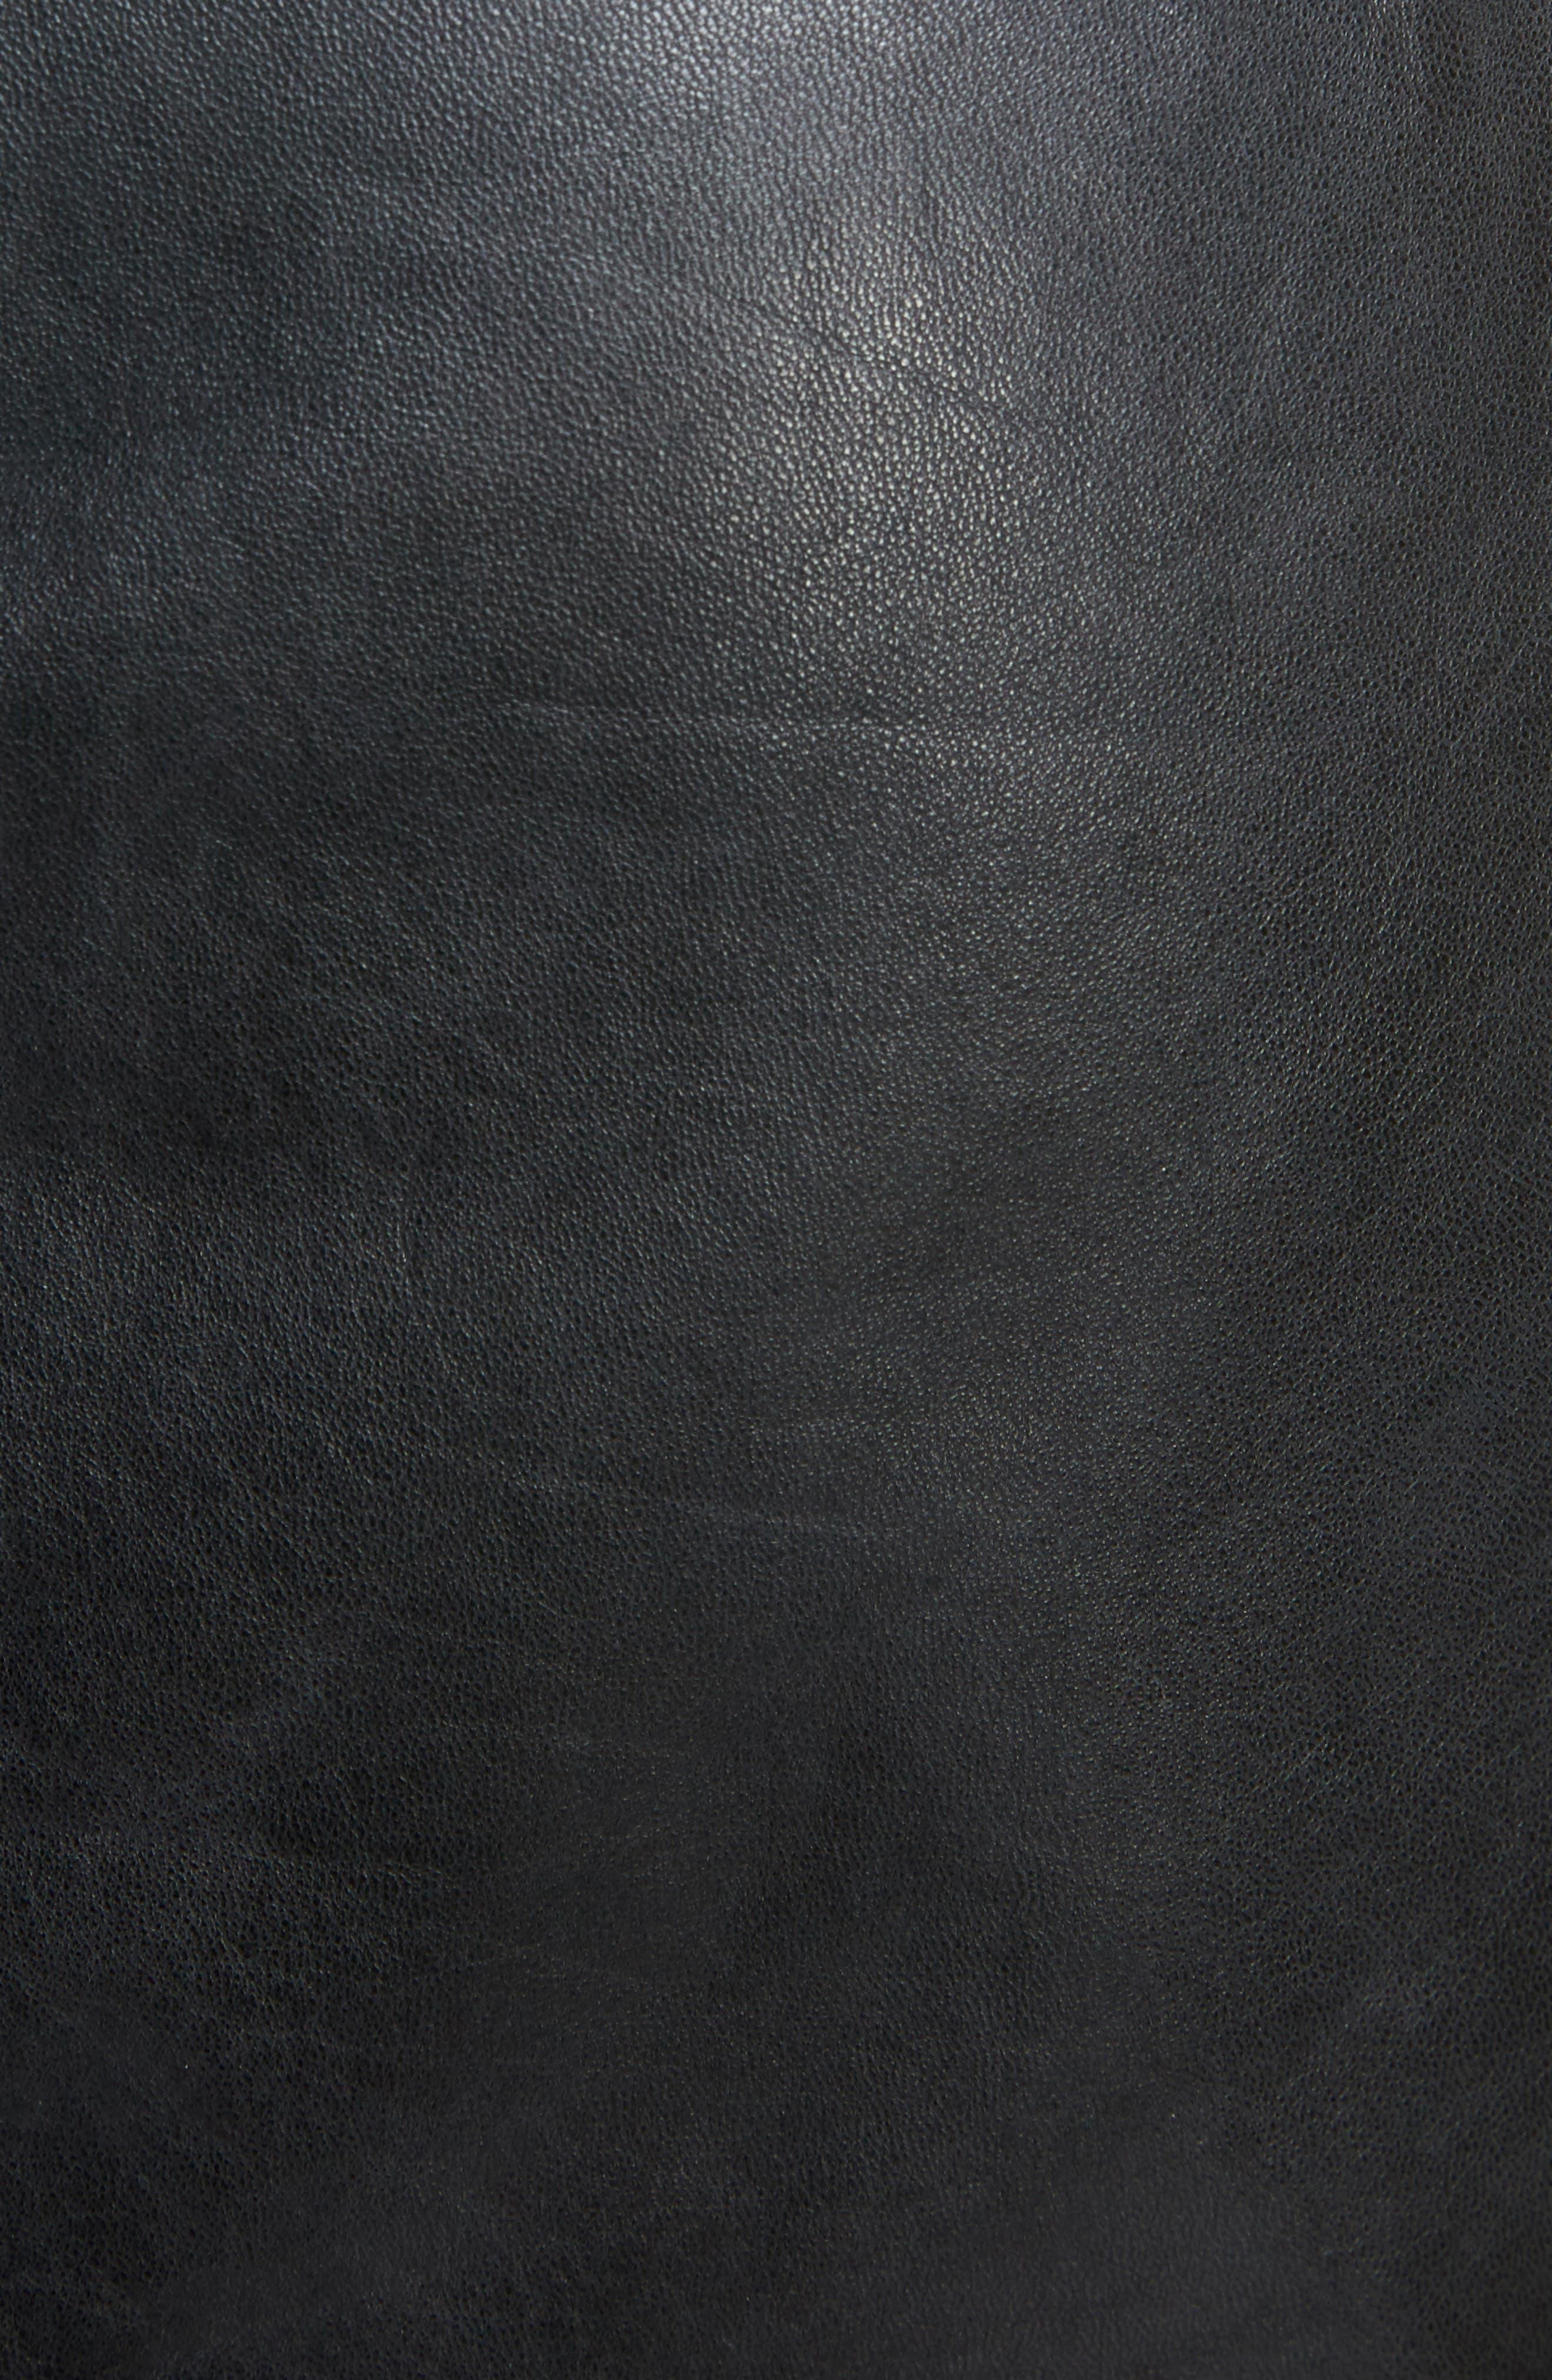 Isabel Marant Étoile Gritanny Tied Leather Skirt,                             Alternate thumbnail 5, color,                             001